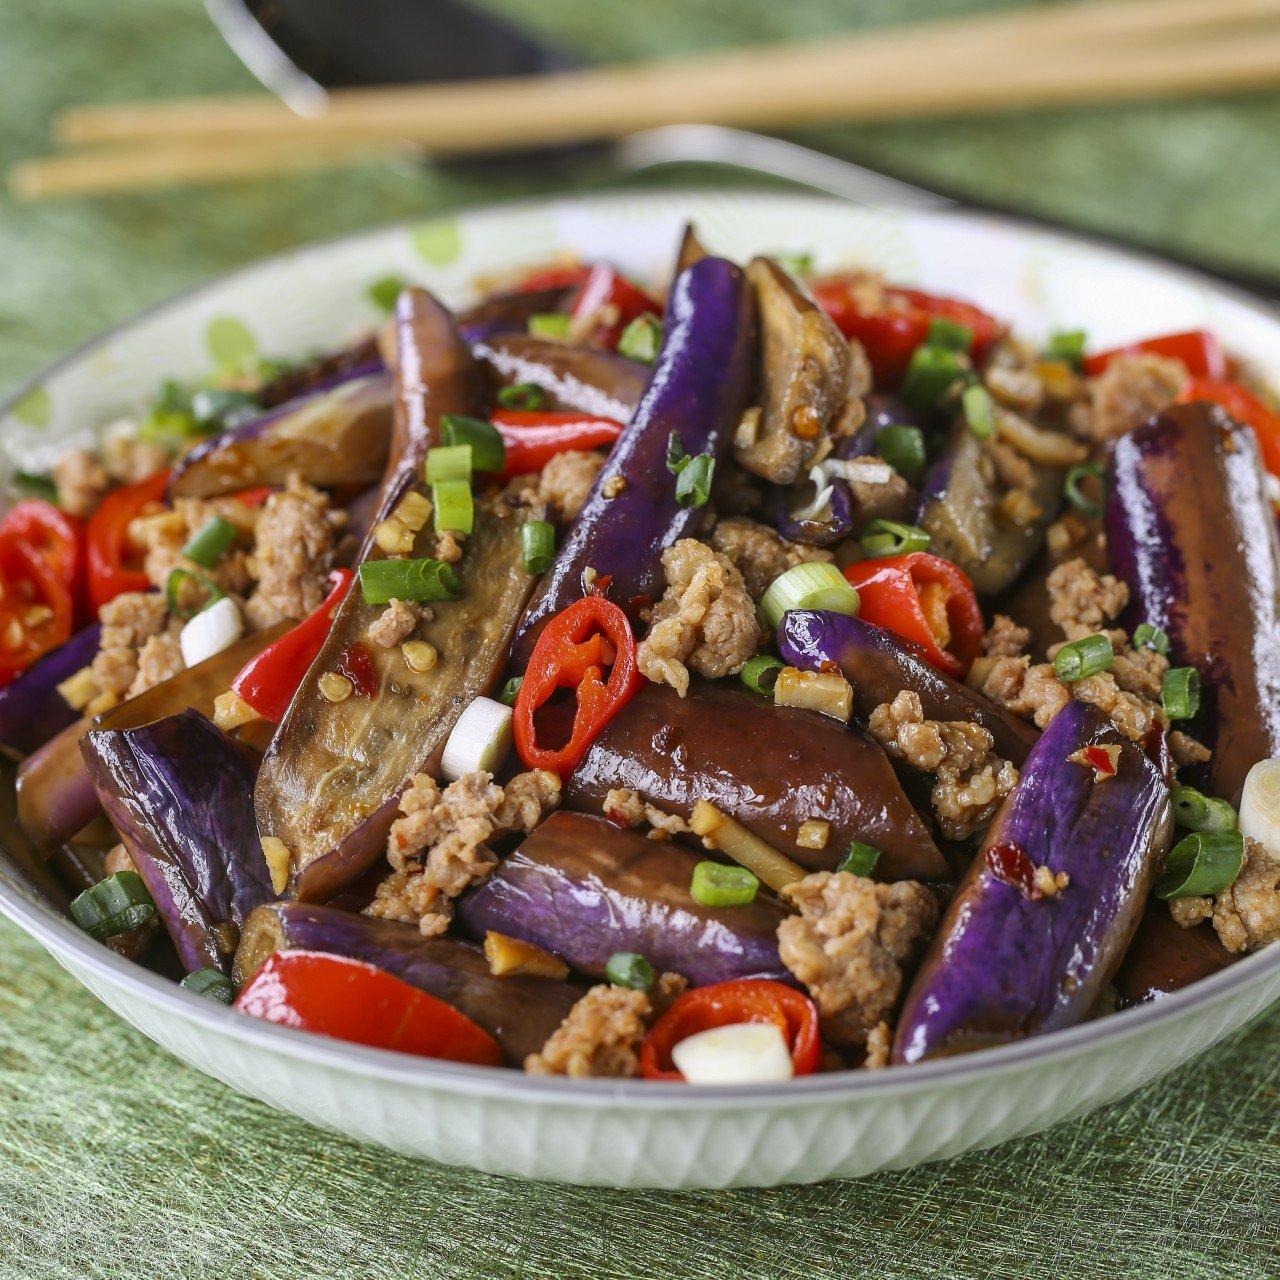 Hong Kong Style Fish Fragrant Eggplant Recipe Scmp Cooking,Fried Dumplings Drawing